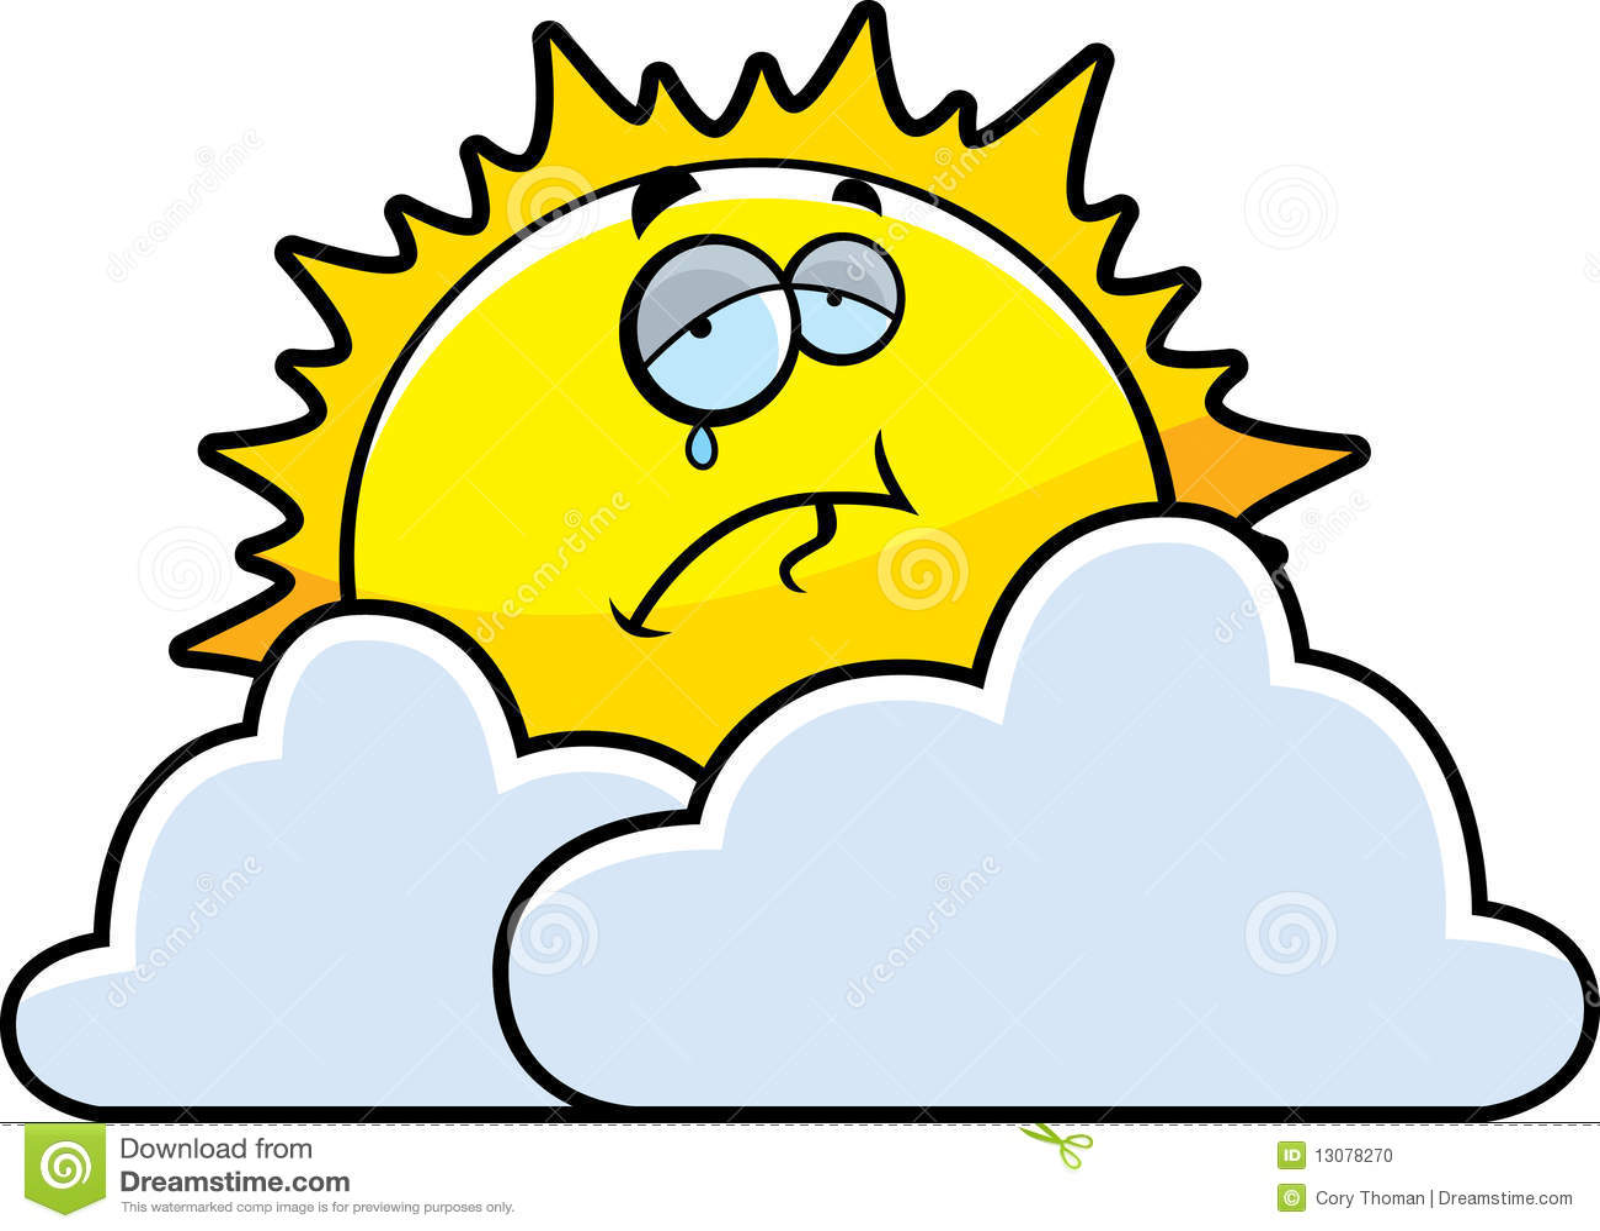 sad sun stock photo image 13078270 smiling sun clip art pics smiling sun clip art images